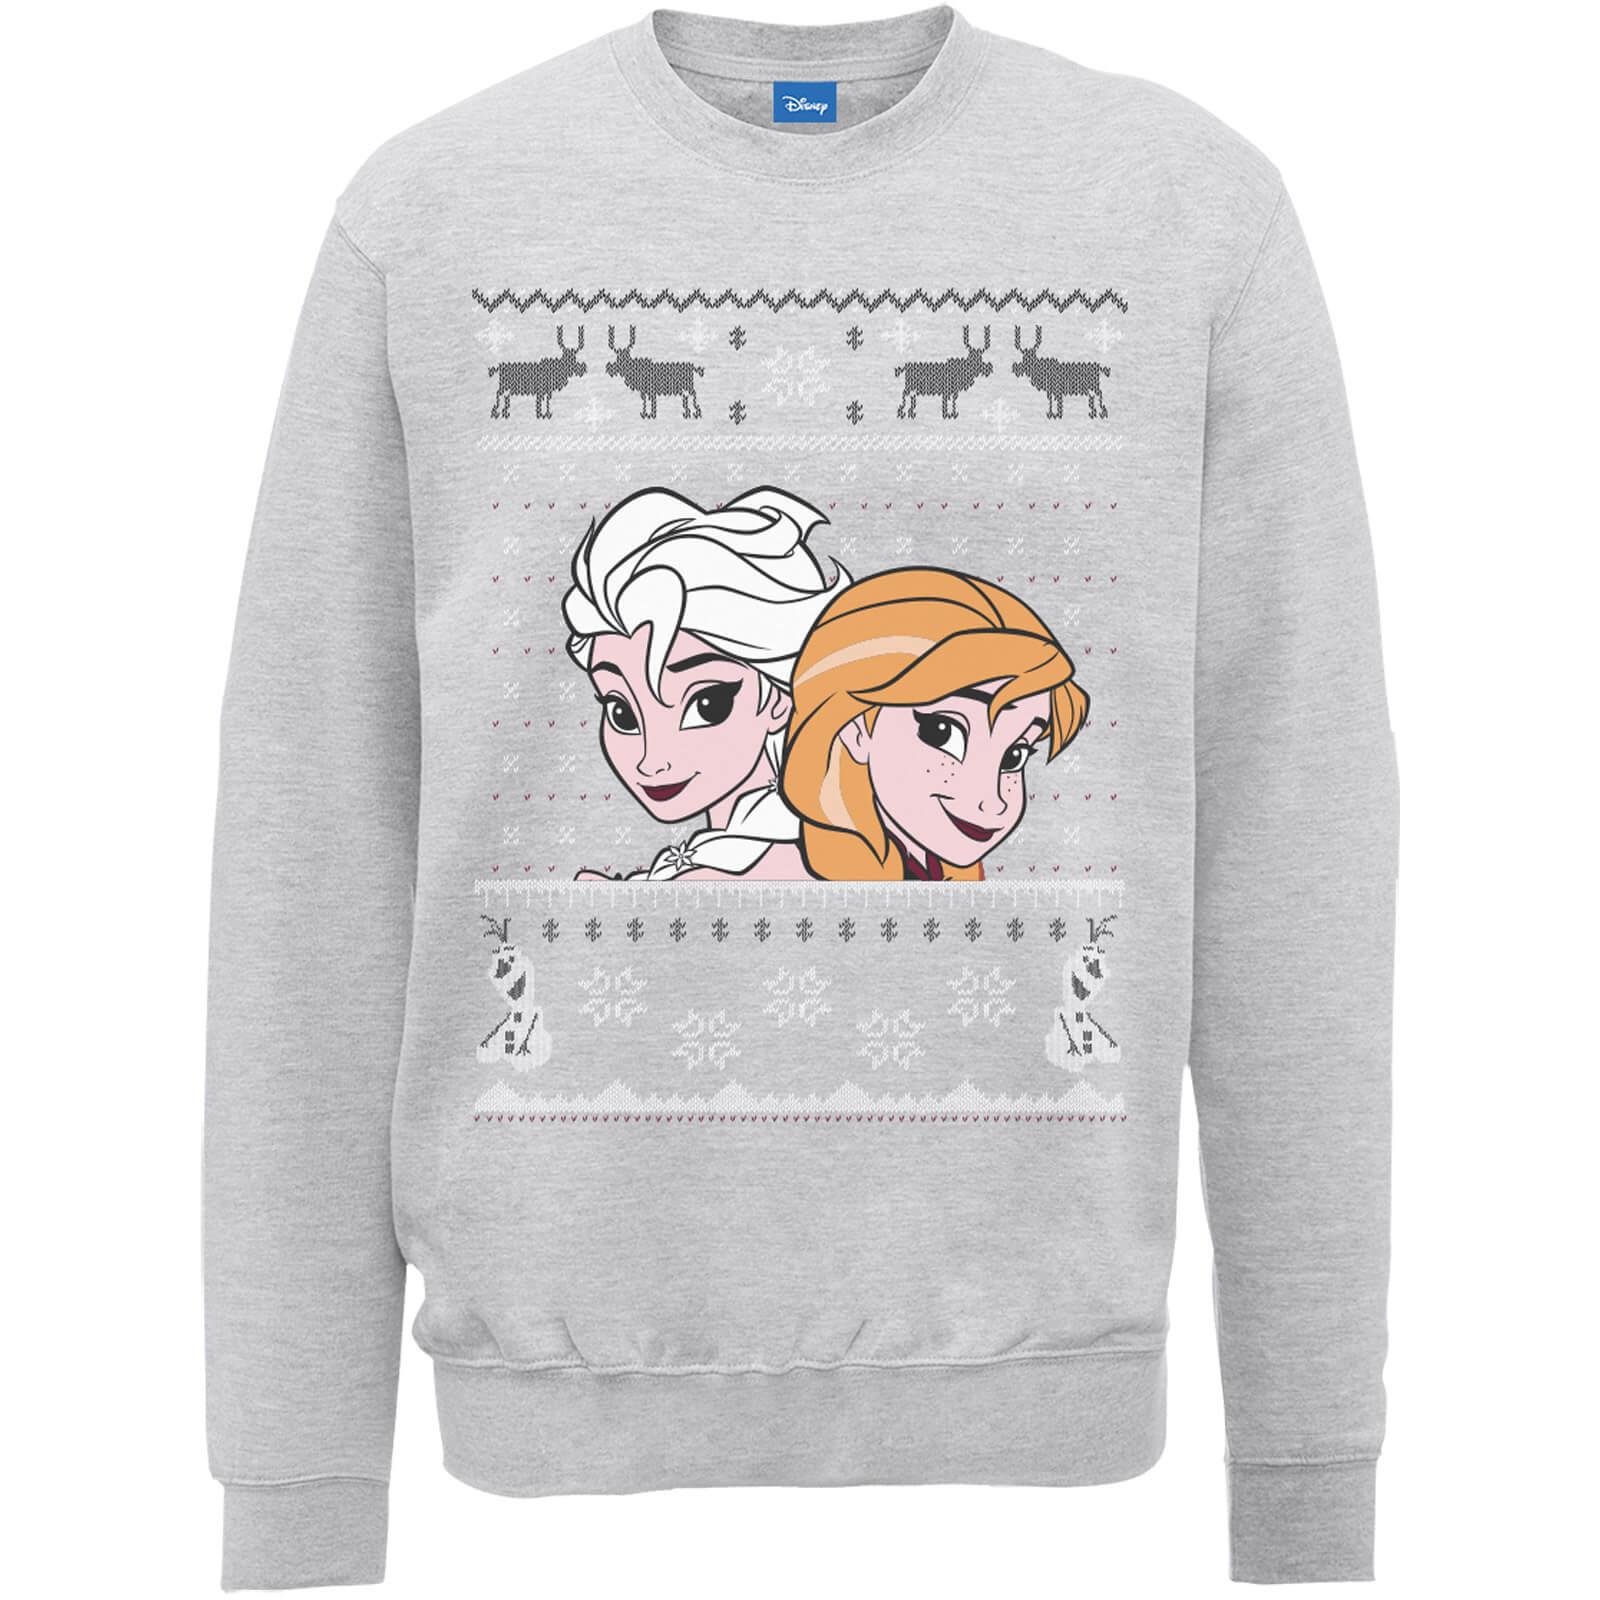 Frozen sweatshirts for £14.99 Delivered using code @ Zavvi